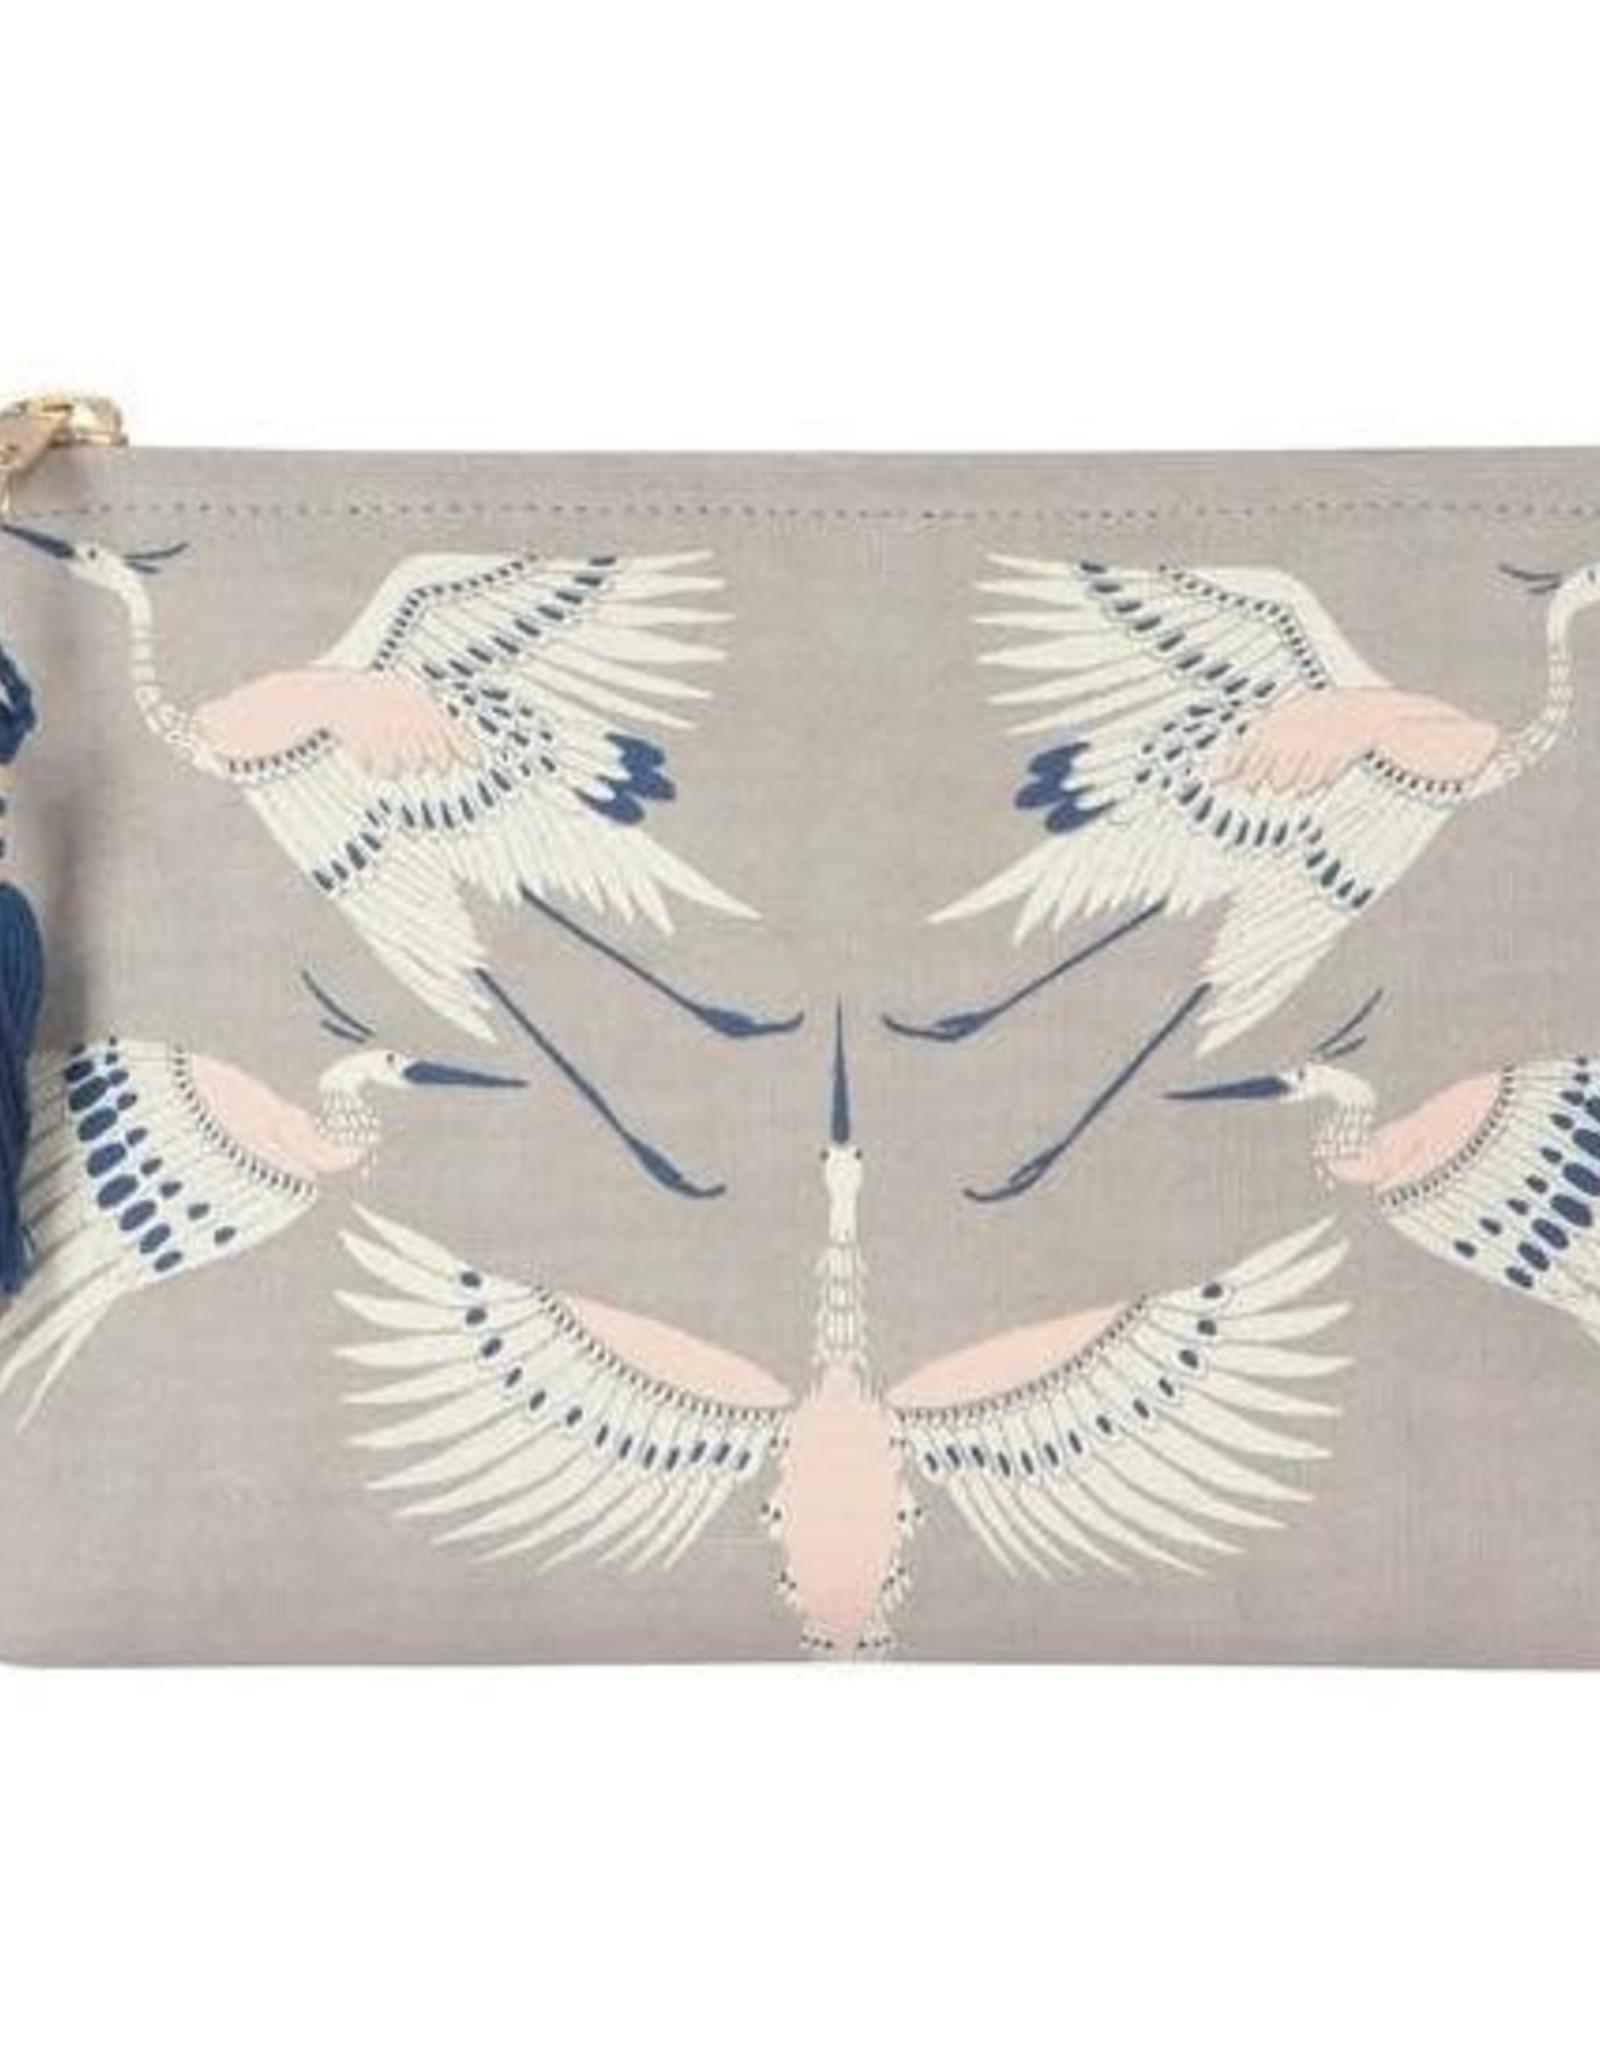 Danica Danica Flight Fancy Cosmetic Bag-Small